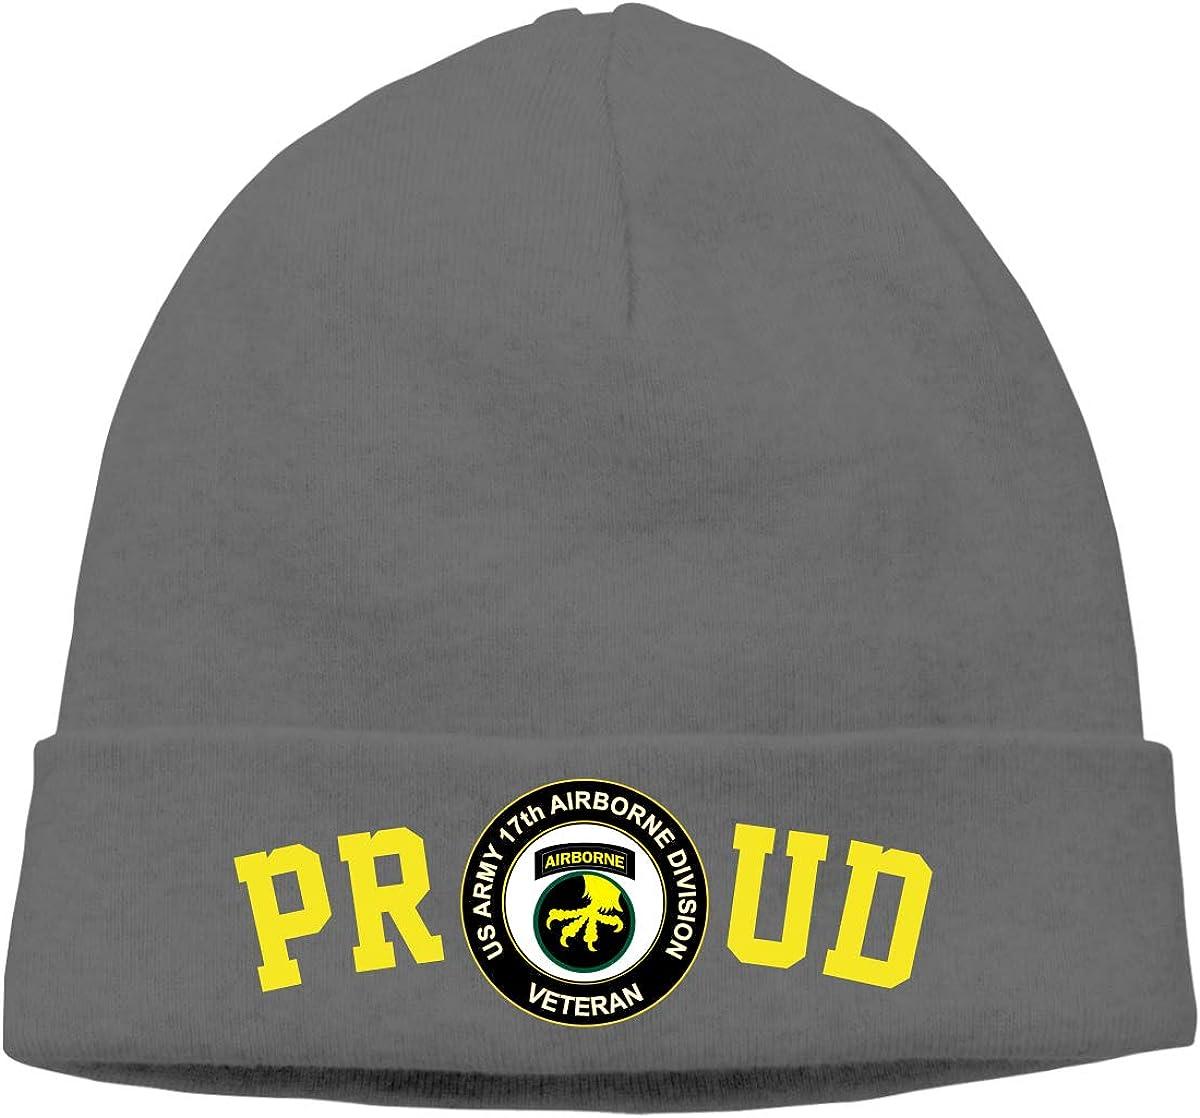 FORDSAN CP Proud US Army Veteran 17th Airborne Division Veteran Mens Beanie Cap Skull Cap Winter Warm Knitting Hats.